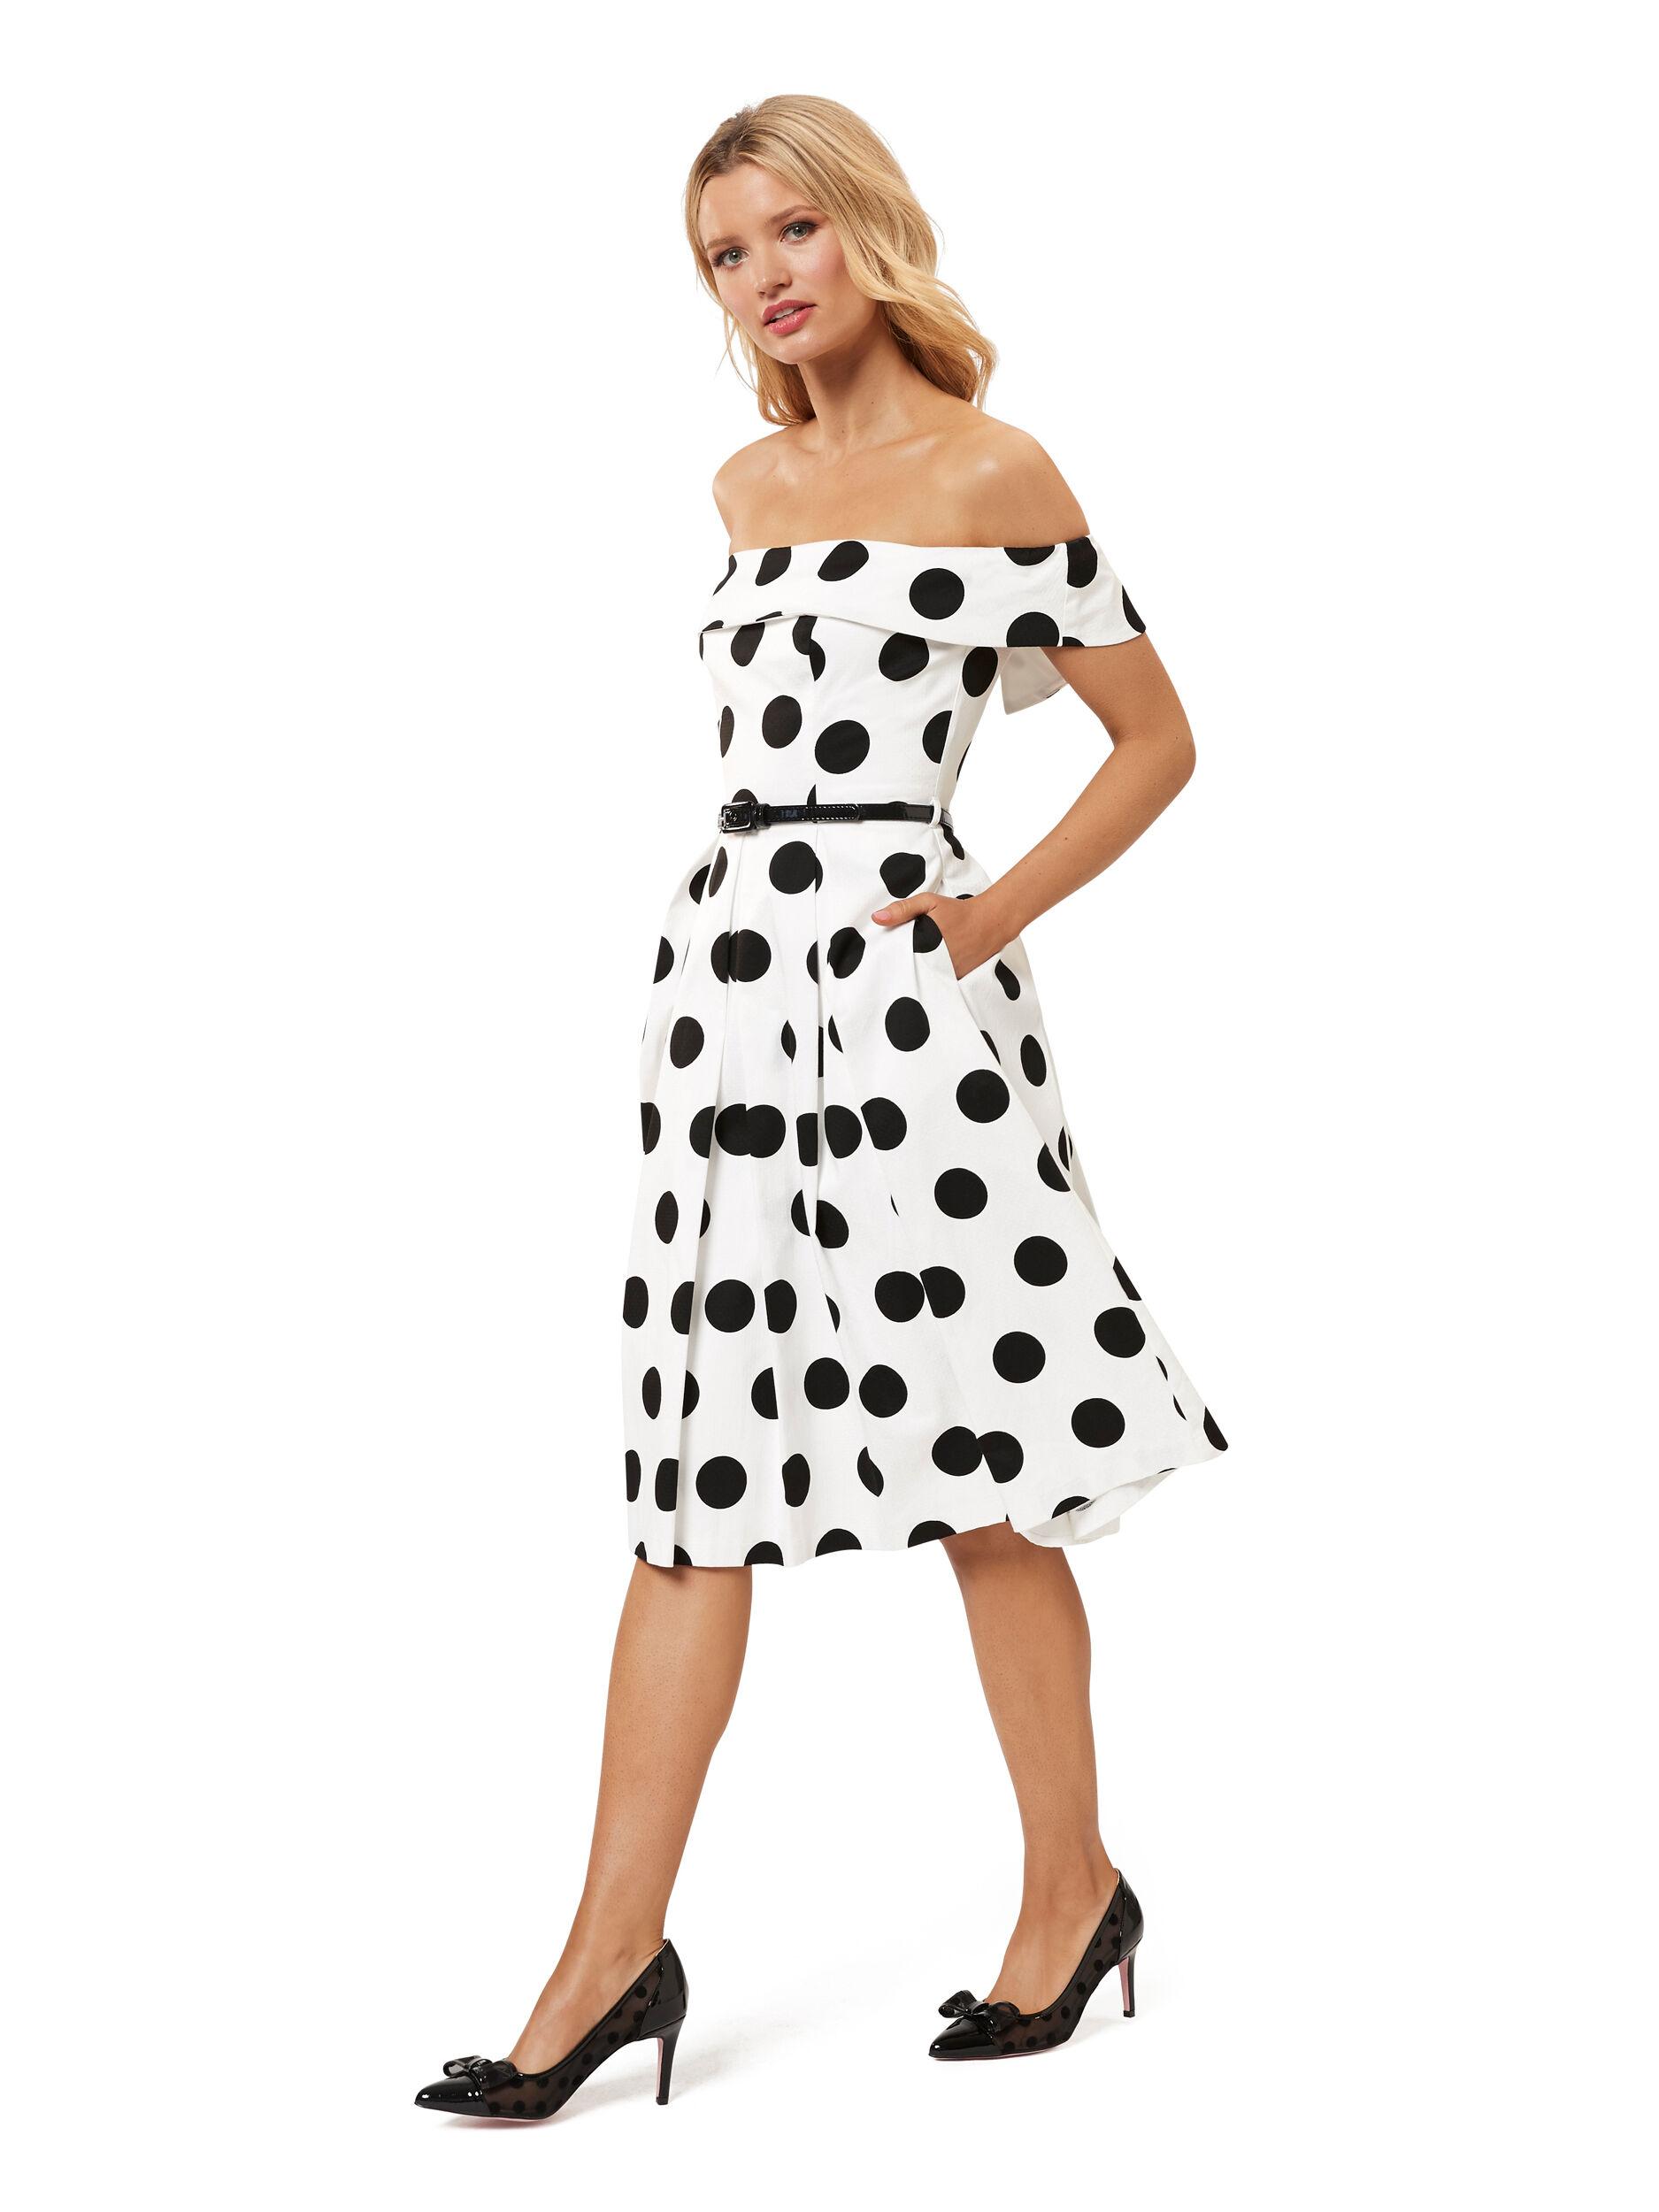 Monaco Spot Dress